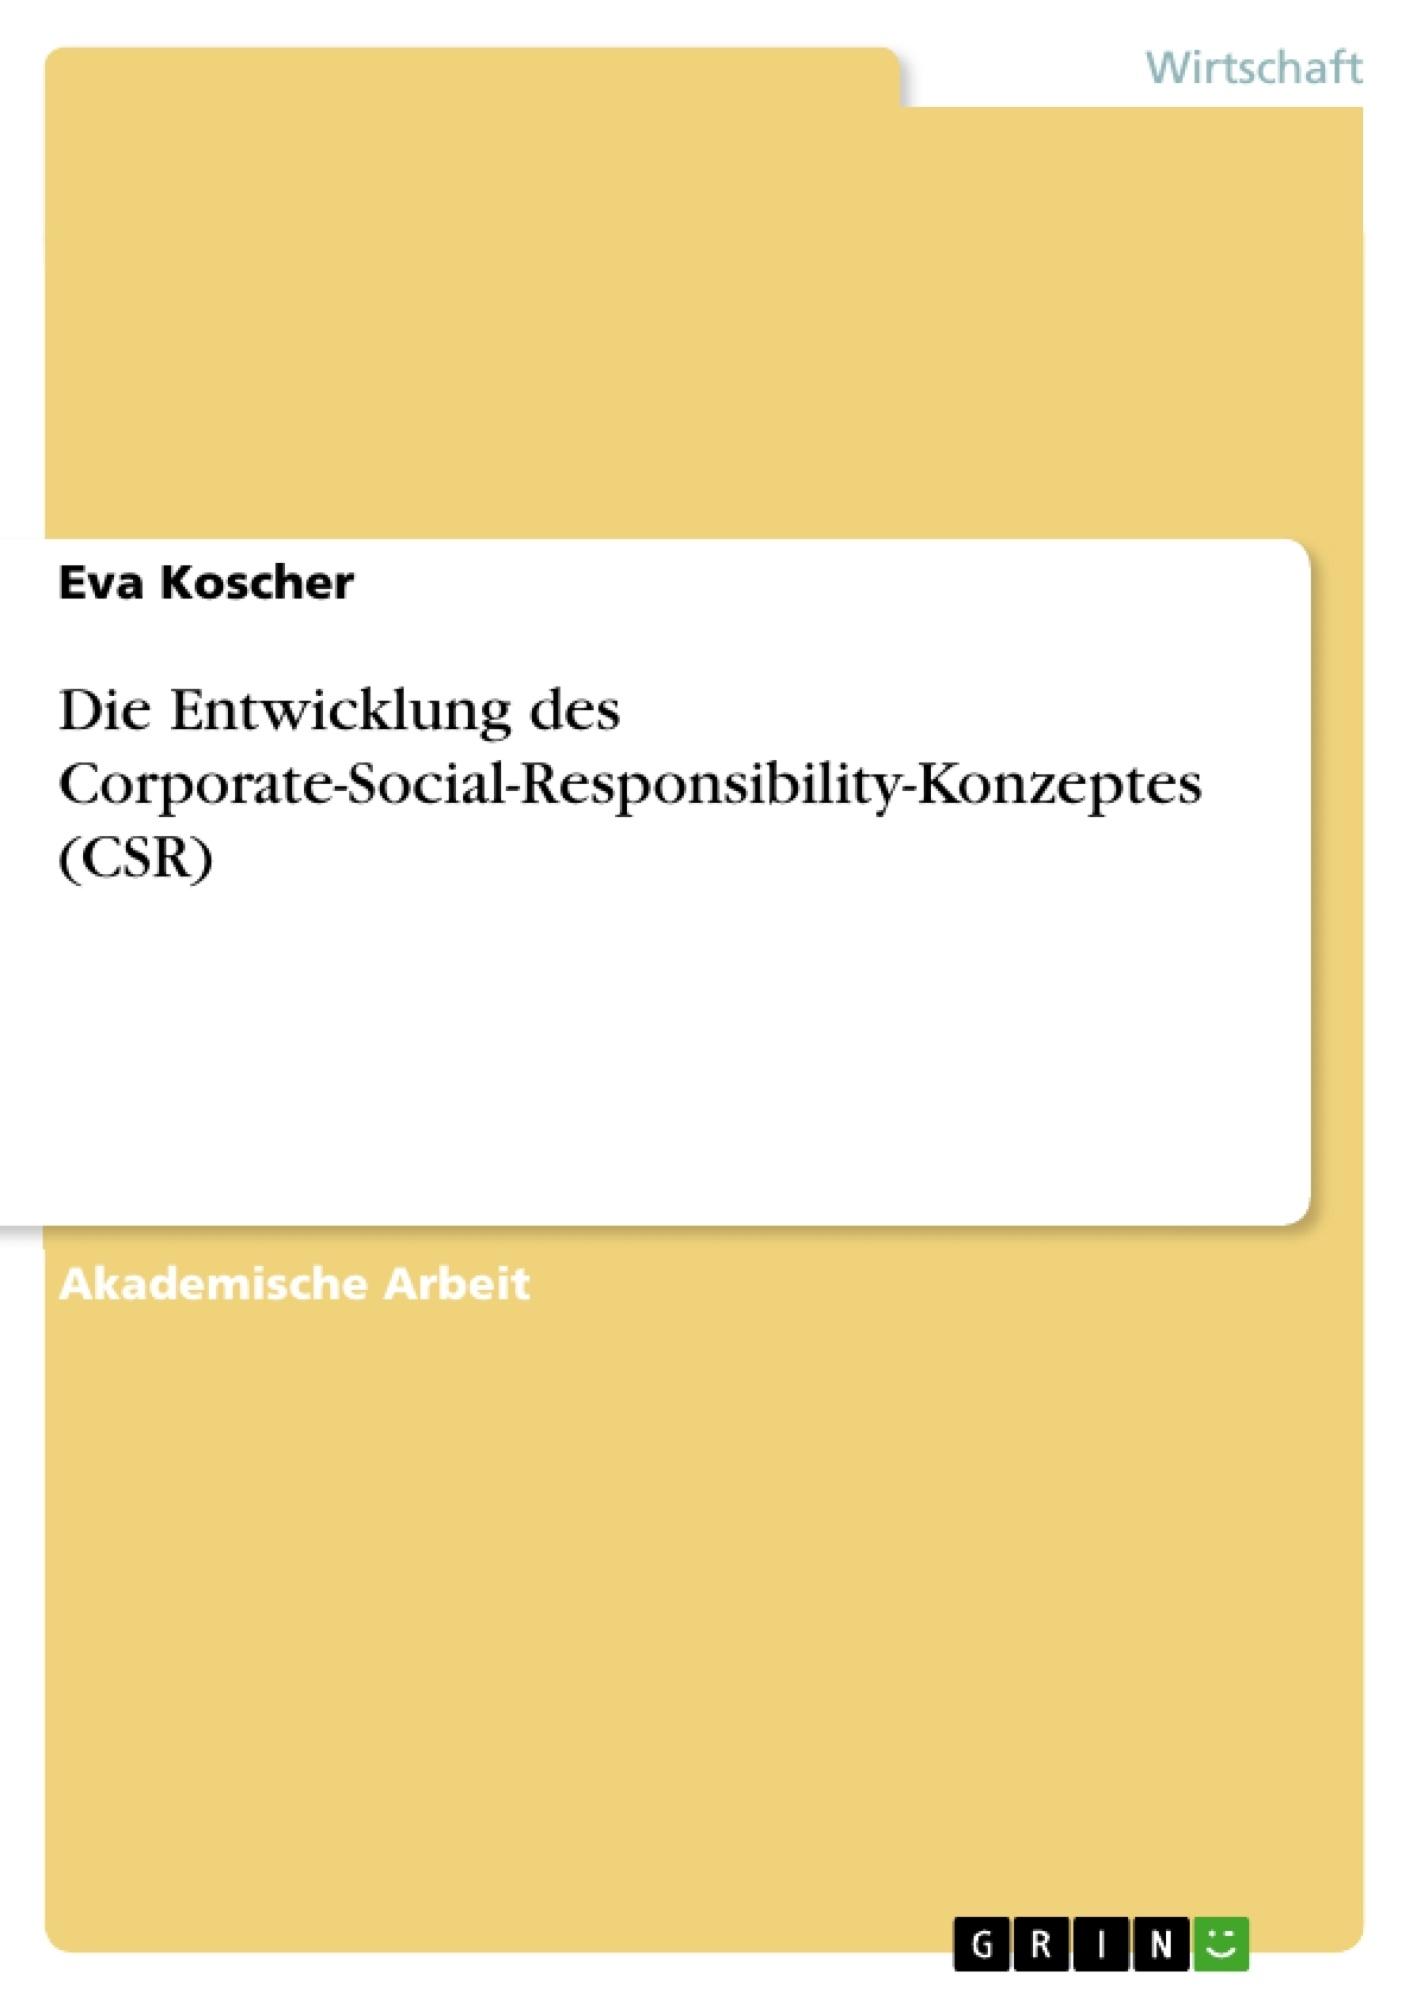 Titel: Die Entwicklung des Corporate-Social-Responsibility-Konzeptes (CSR)